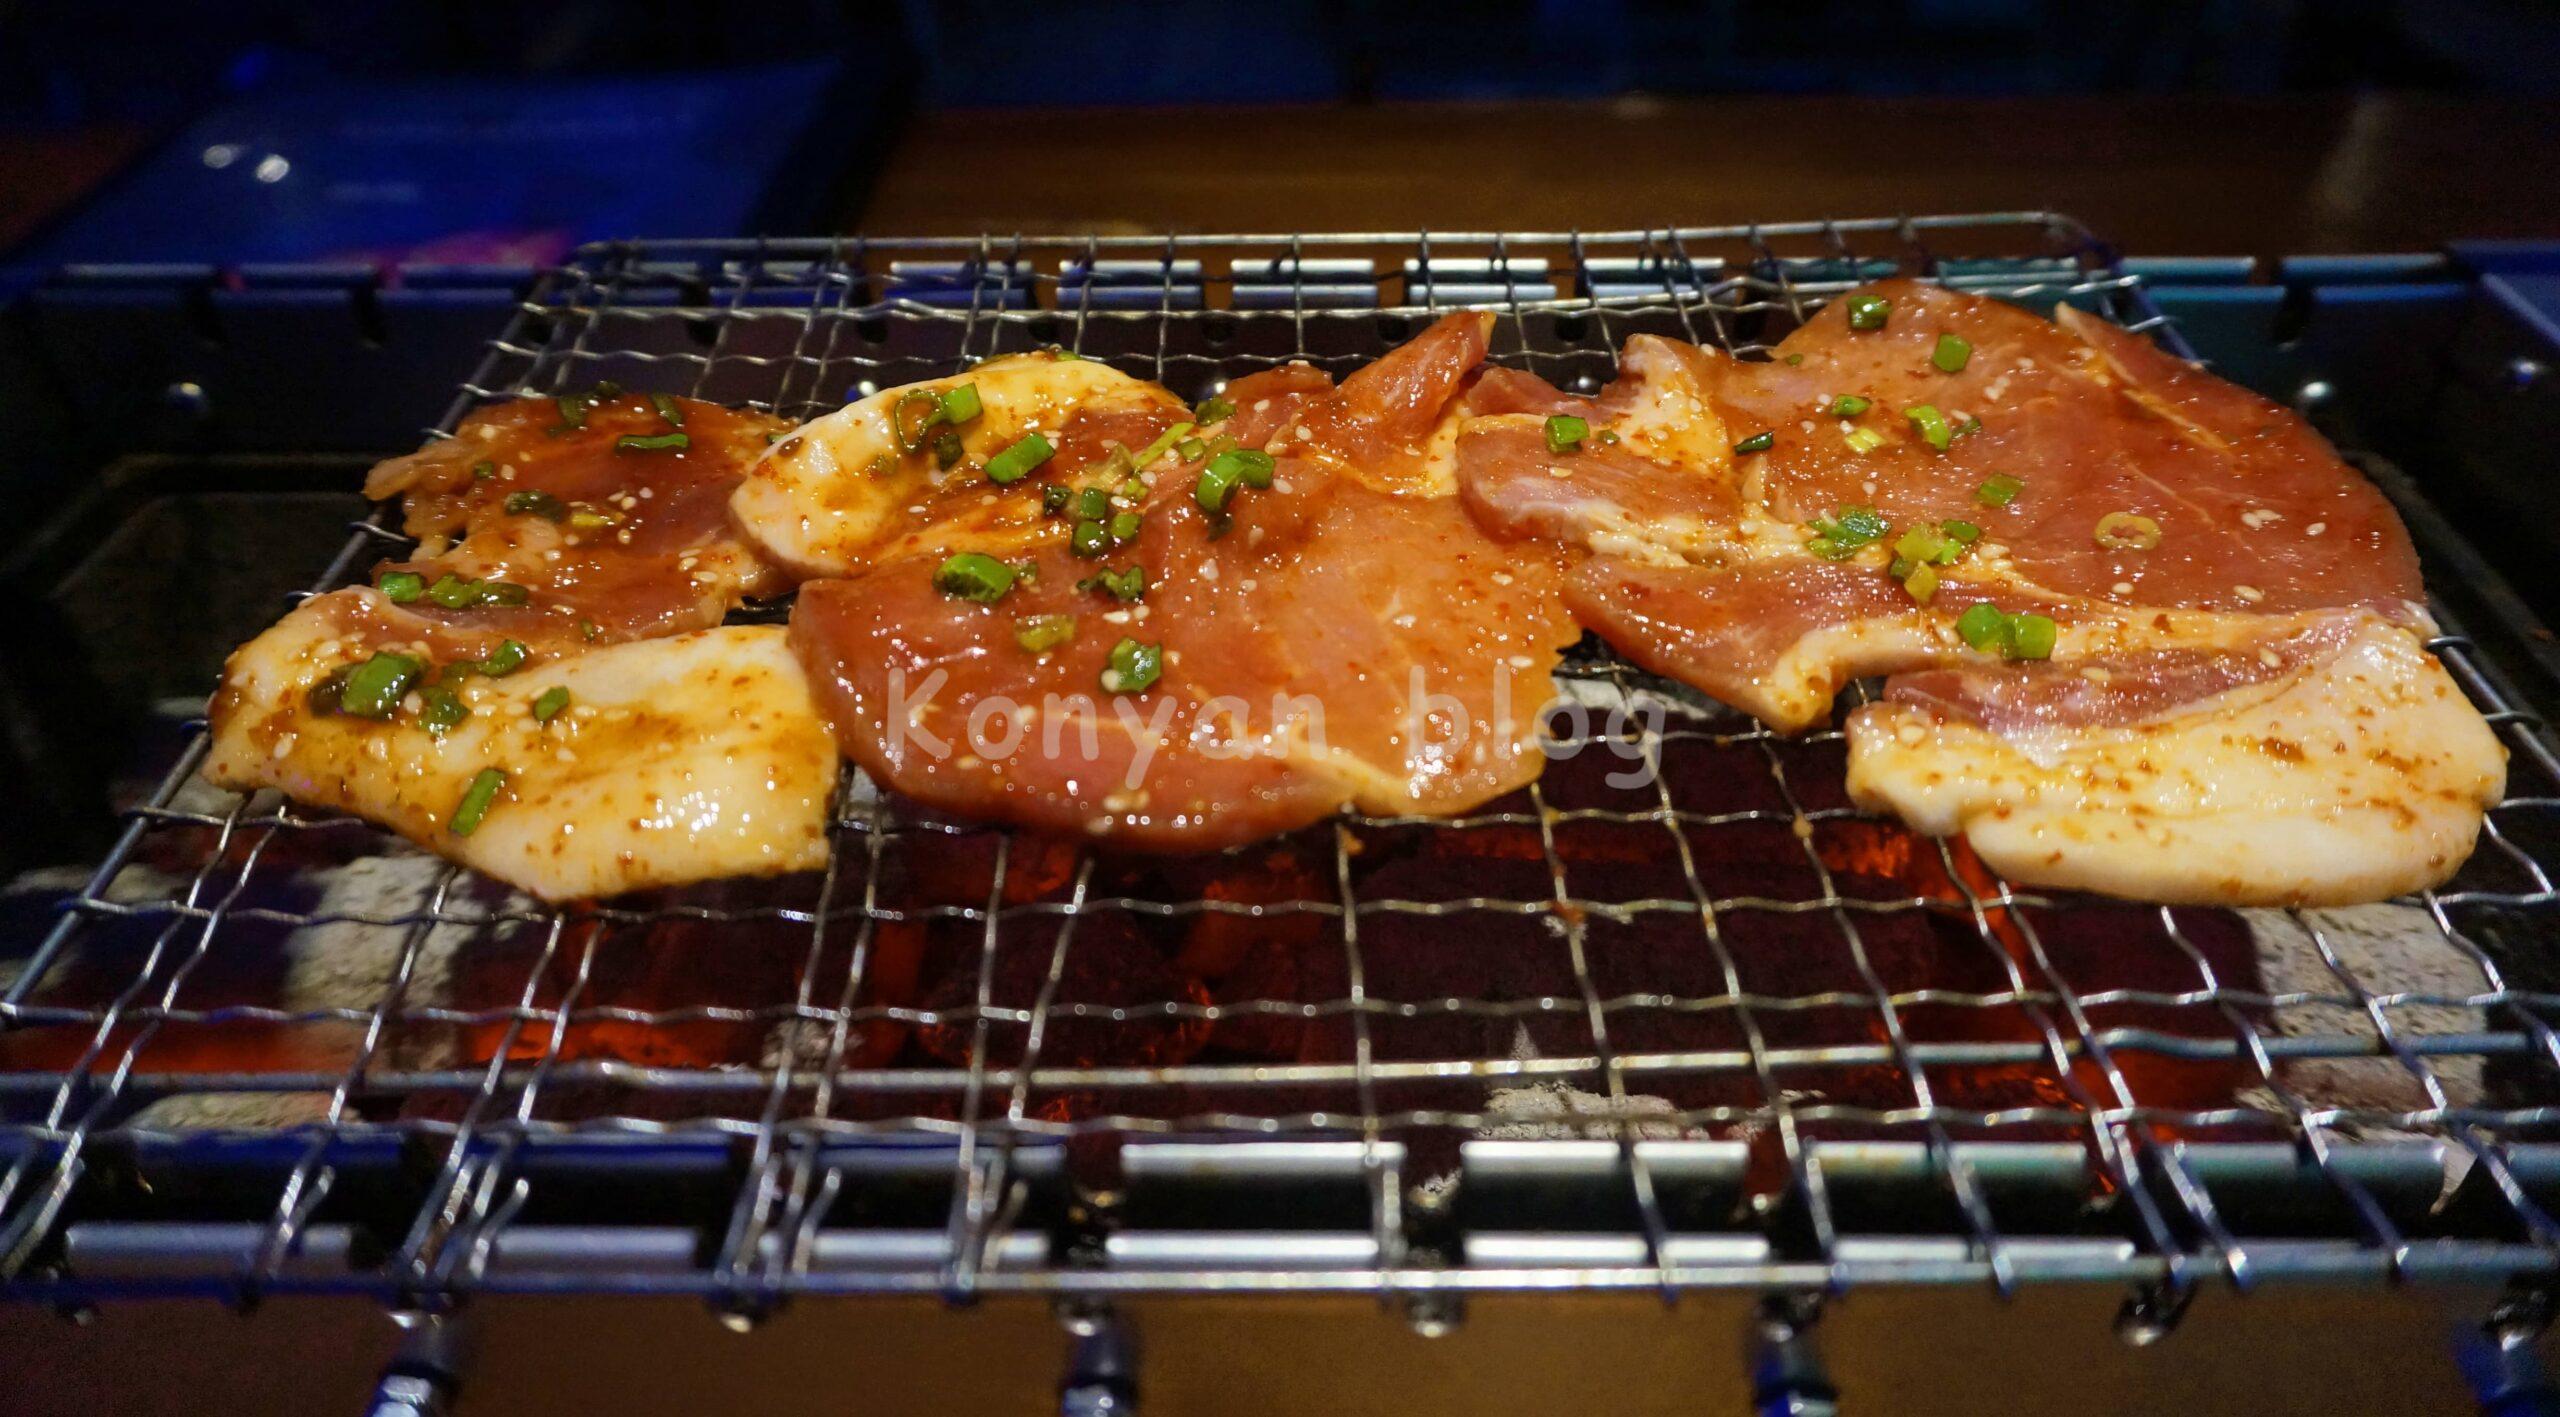 BBQ BAR 串越时光 PJ SS2 豚肉